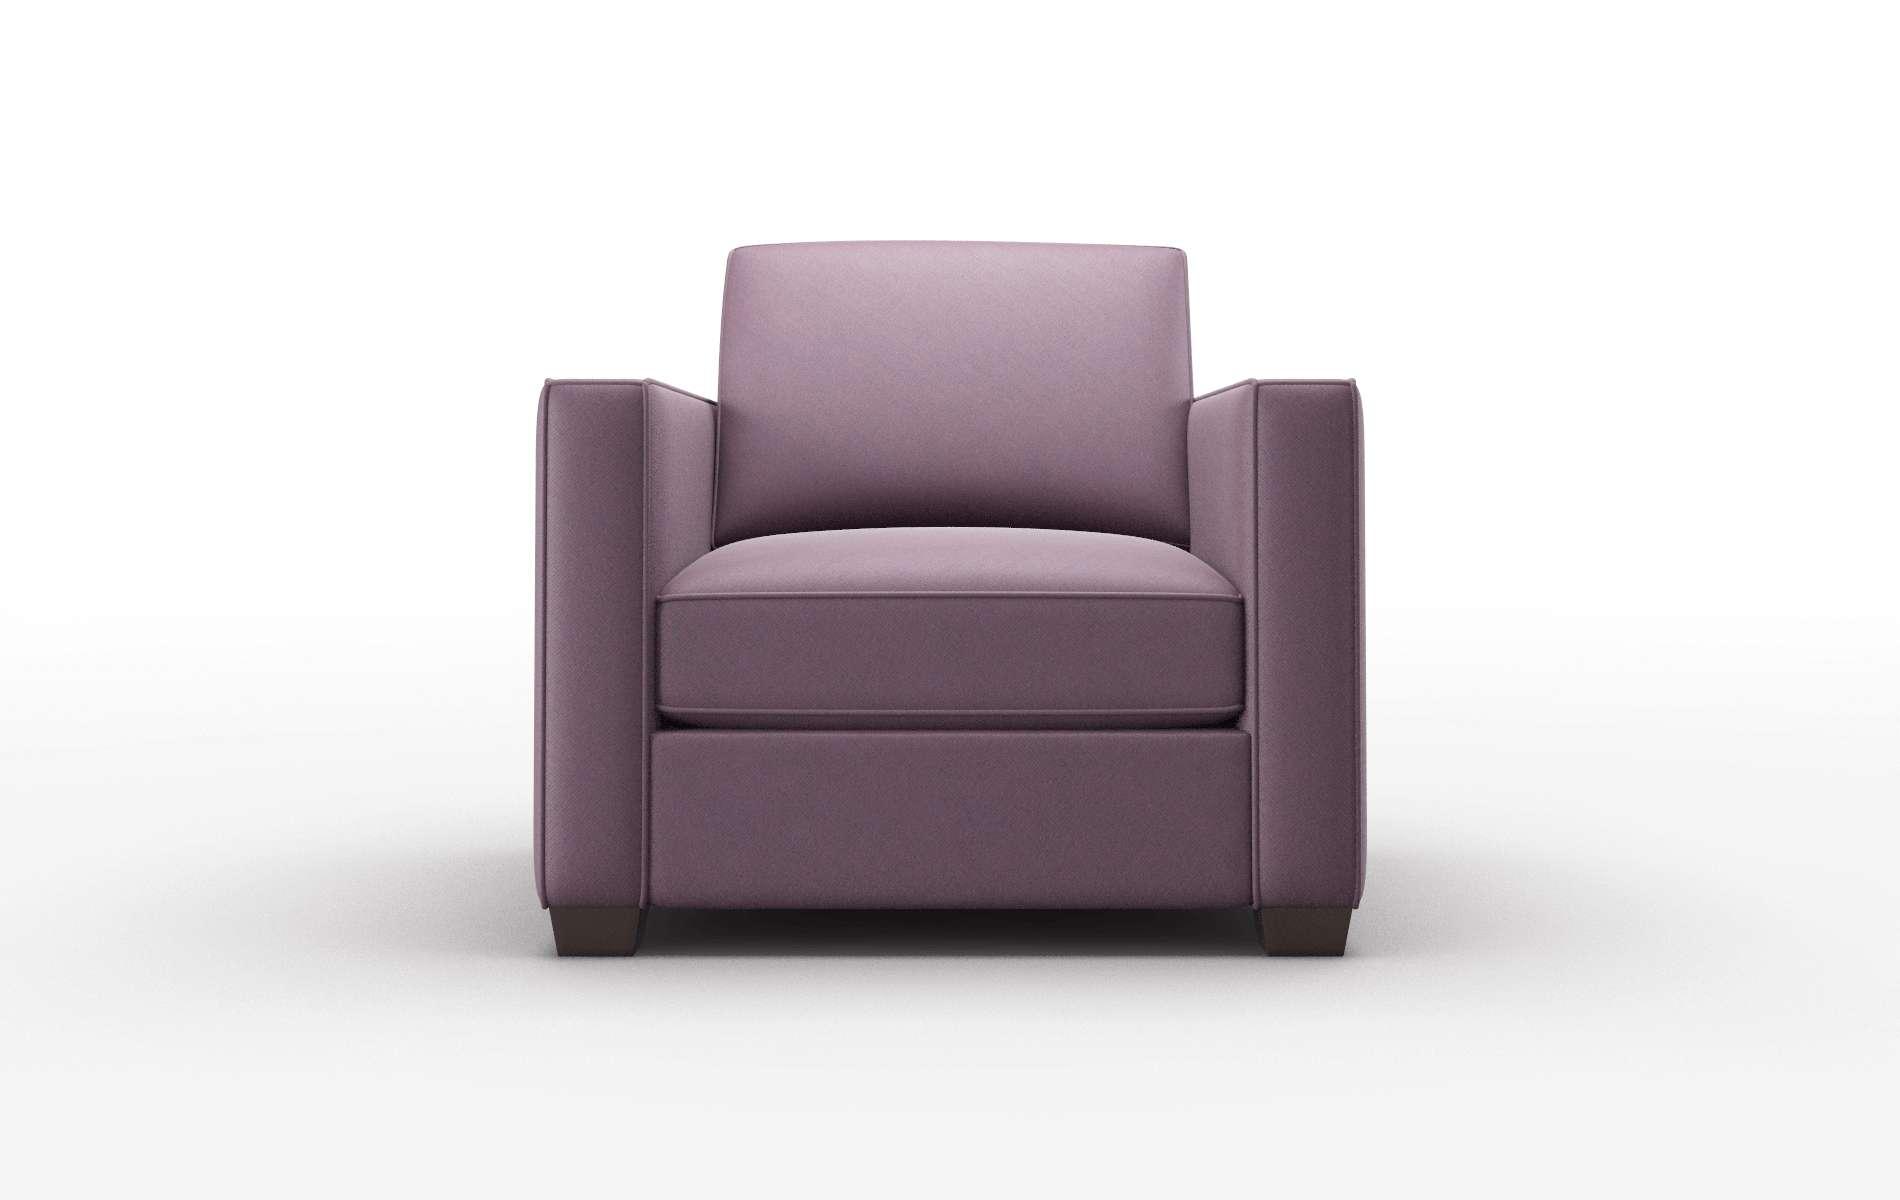 Calgary Bella Aubergine Chair espresso legs 1